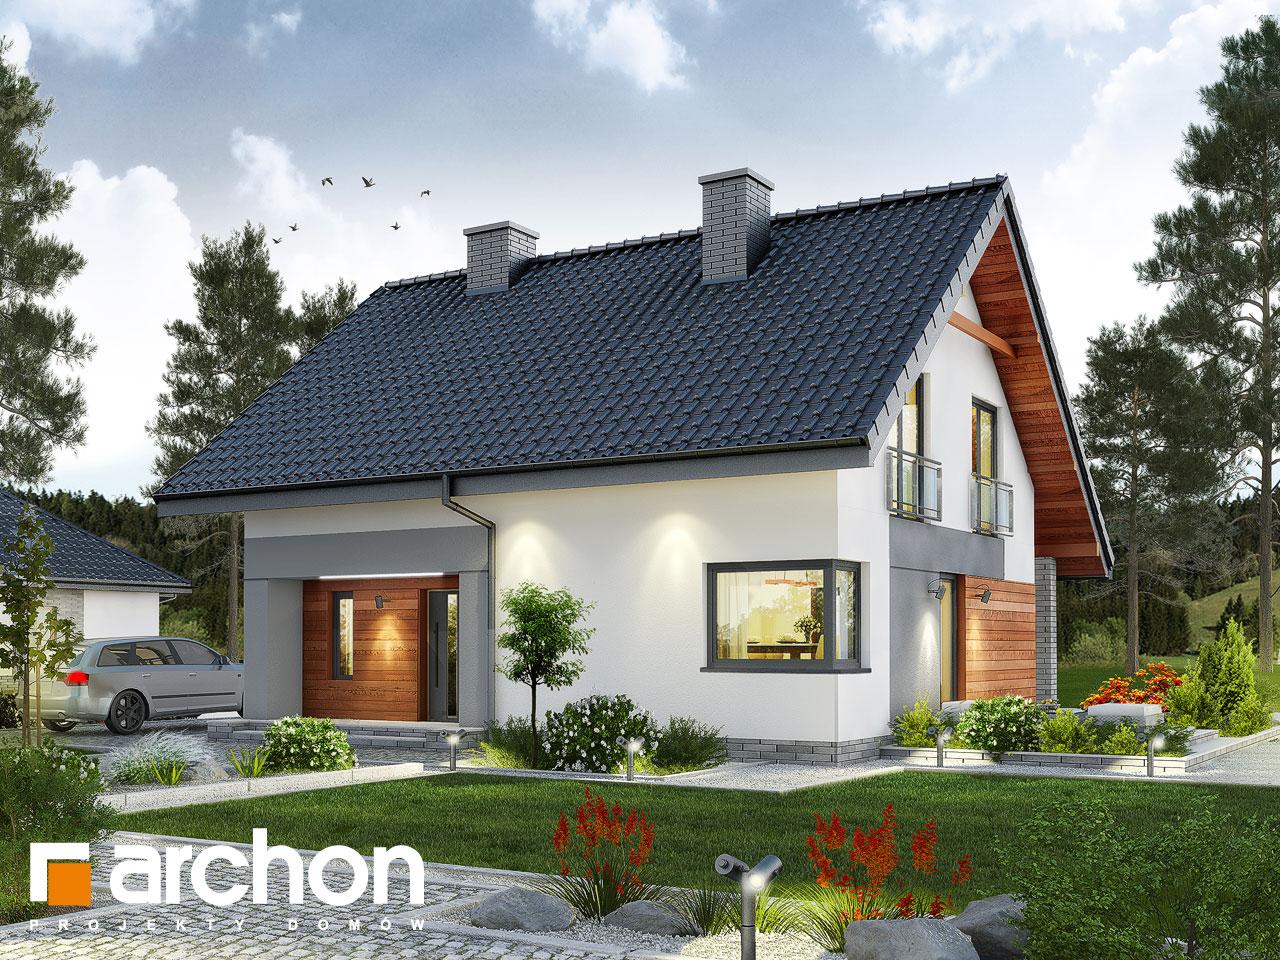 projekt domu dom w malin wkach archon. Black Bedroom Furniture Sets. Home Design Ideas